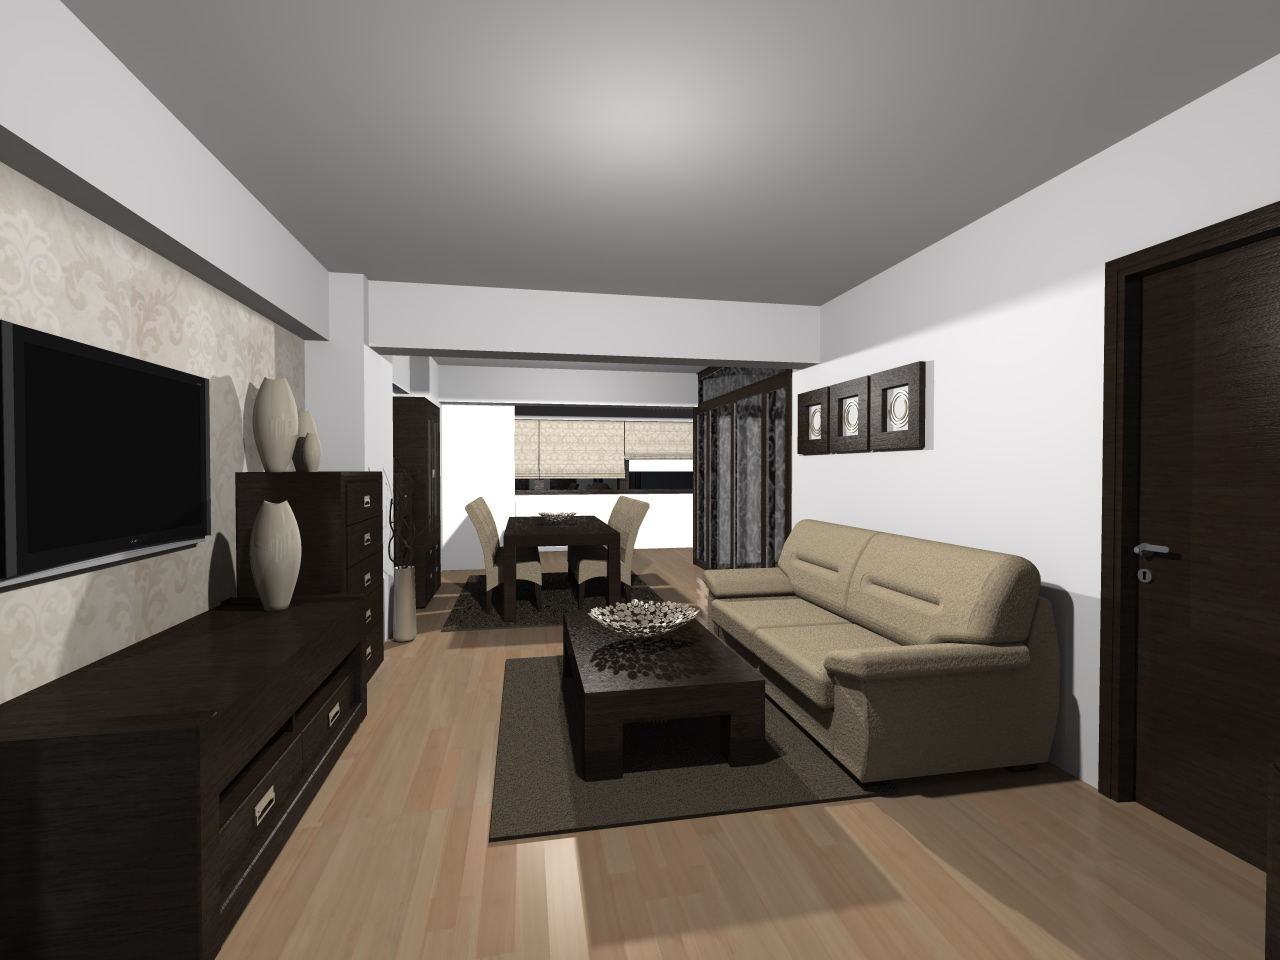 Usi Beci moreover Index together with Proiect Casa Duplex E6012 moreover Locuinta Pe Teren In Panta also amenajari Interioare. on design interior amenajari interioare